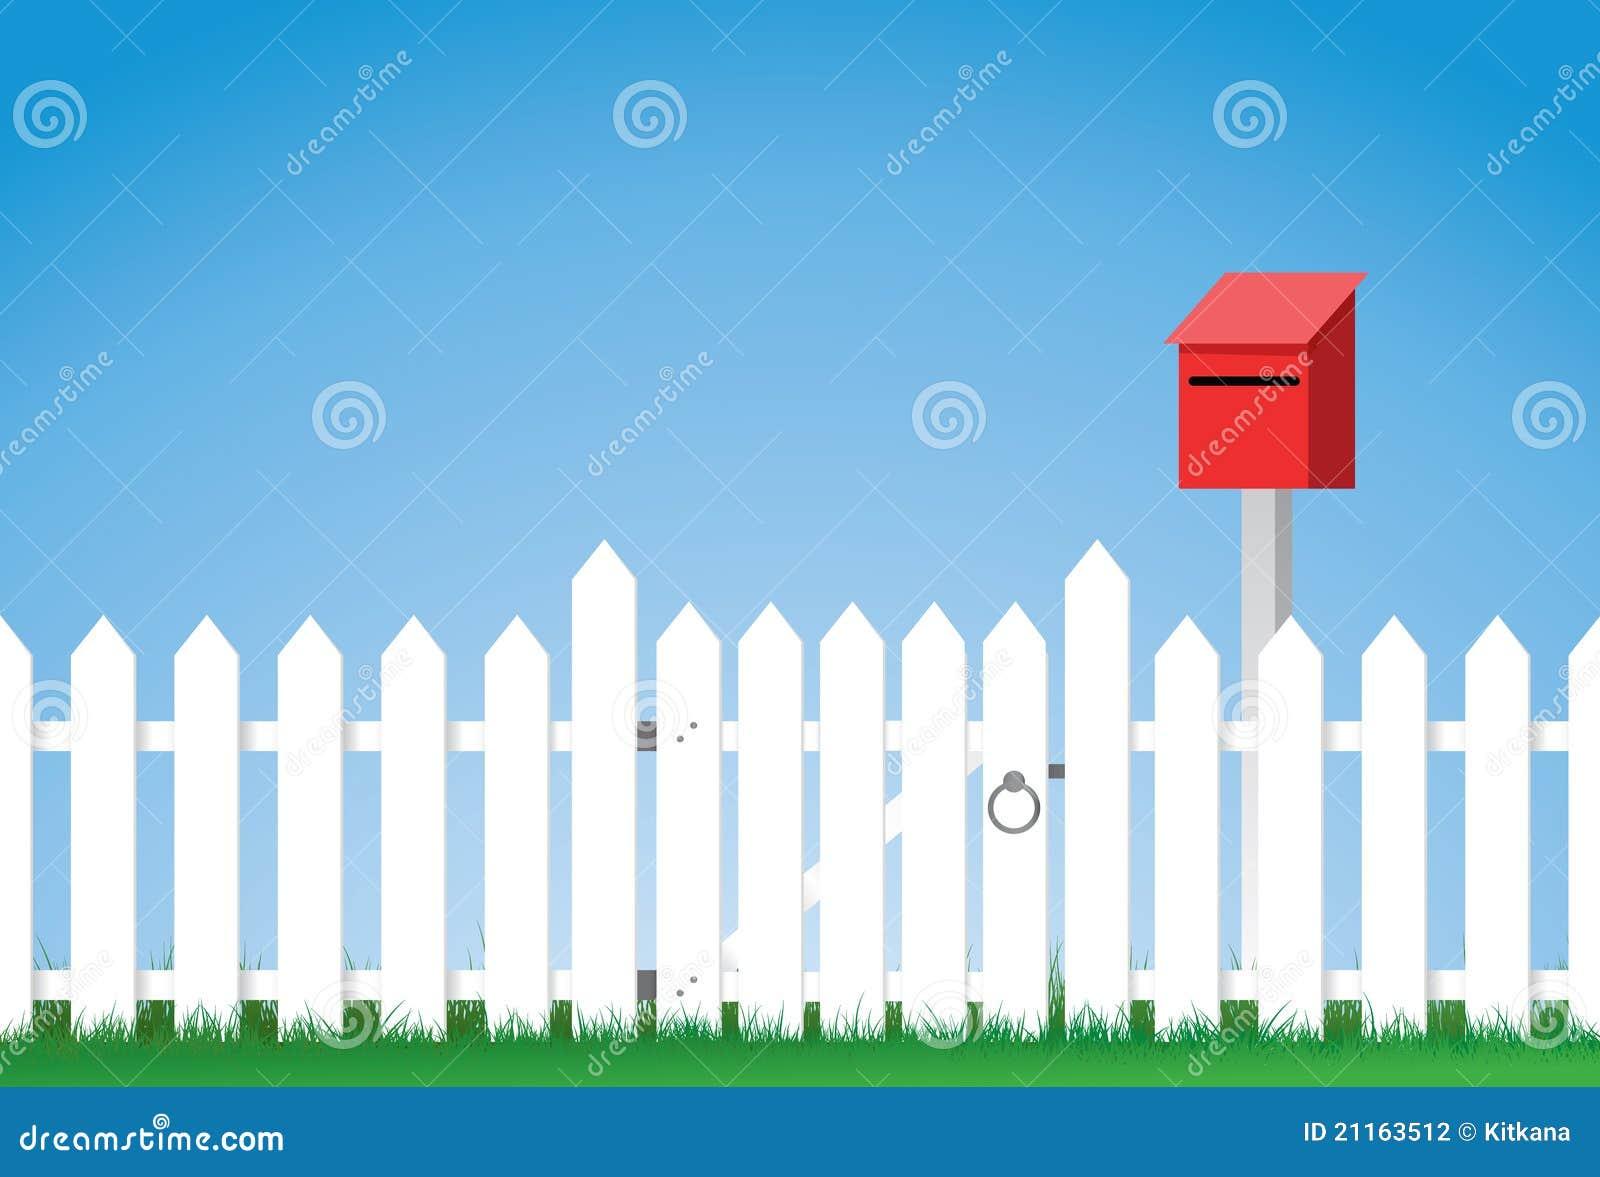 Gated White Picket Fence Stock Photography Image 21163512